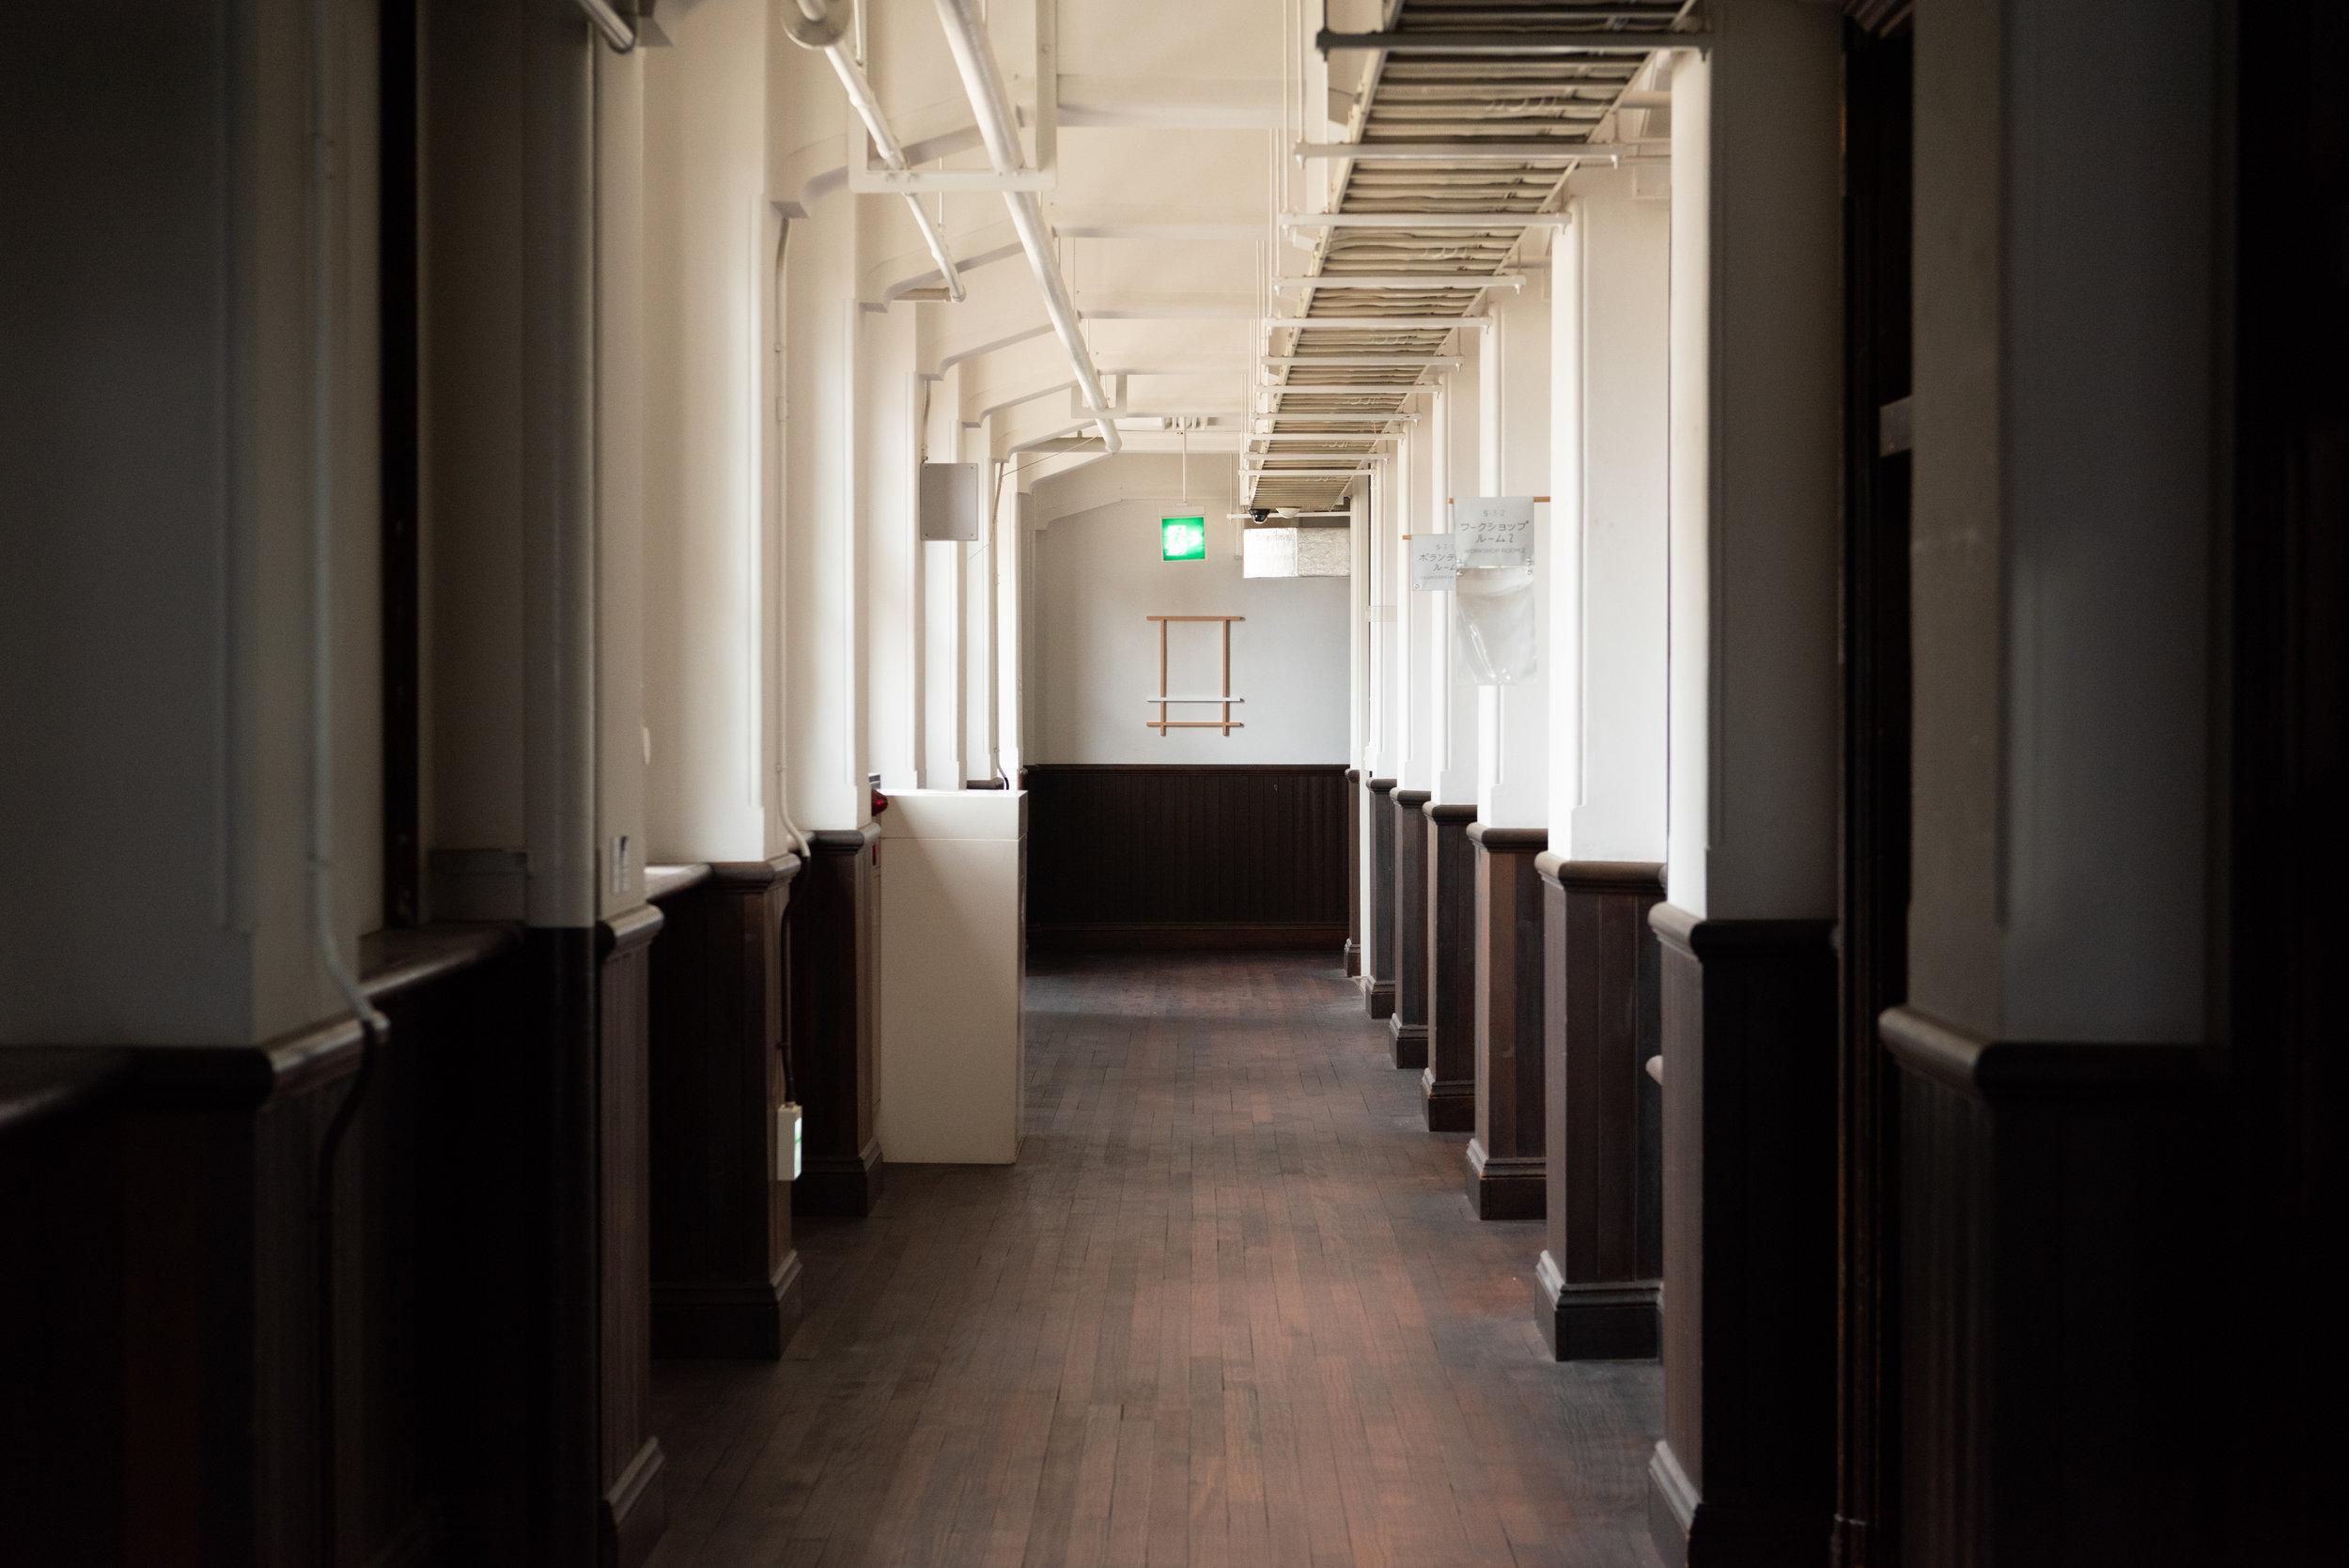 Meirin, 2018  Solo show. Kyoto Art Center, Kyoto  Residency Prize 20º Festival de Arte Contemporânea Sesc_Videobrasil